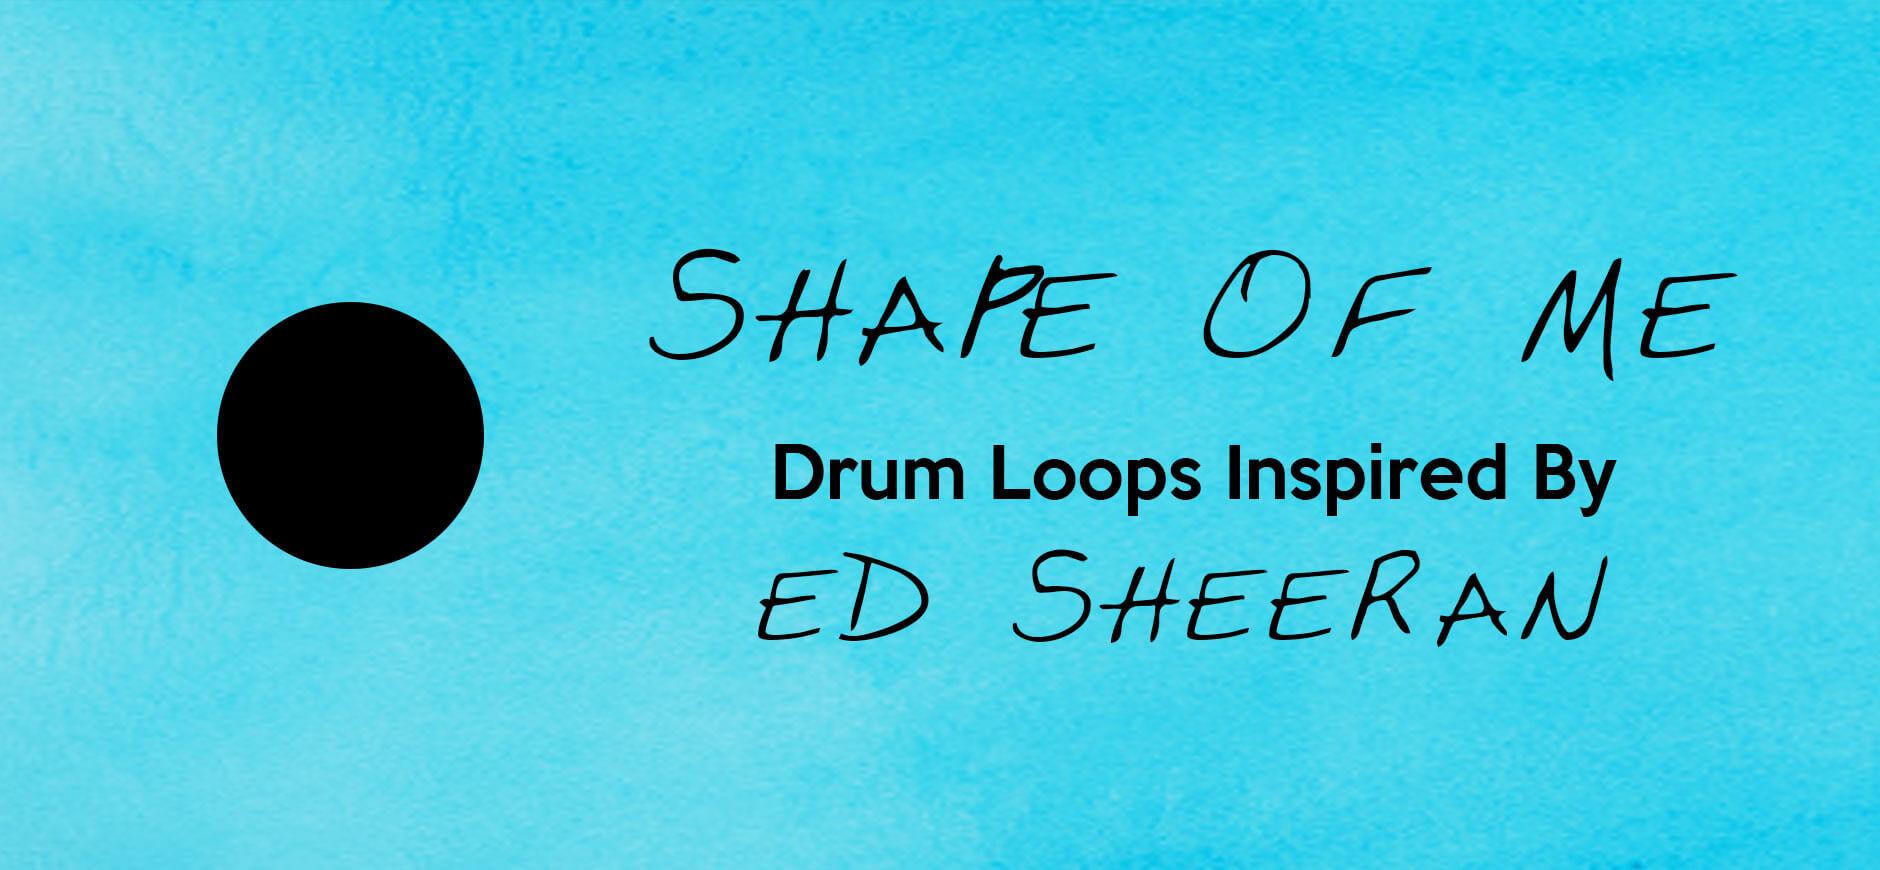 Shape of You Drum Loops Inspired by Ed Sheeran